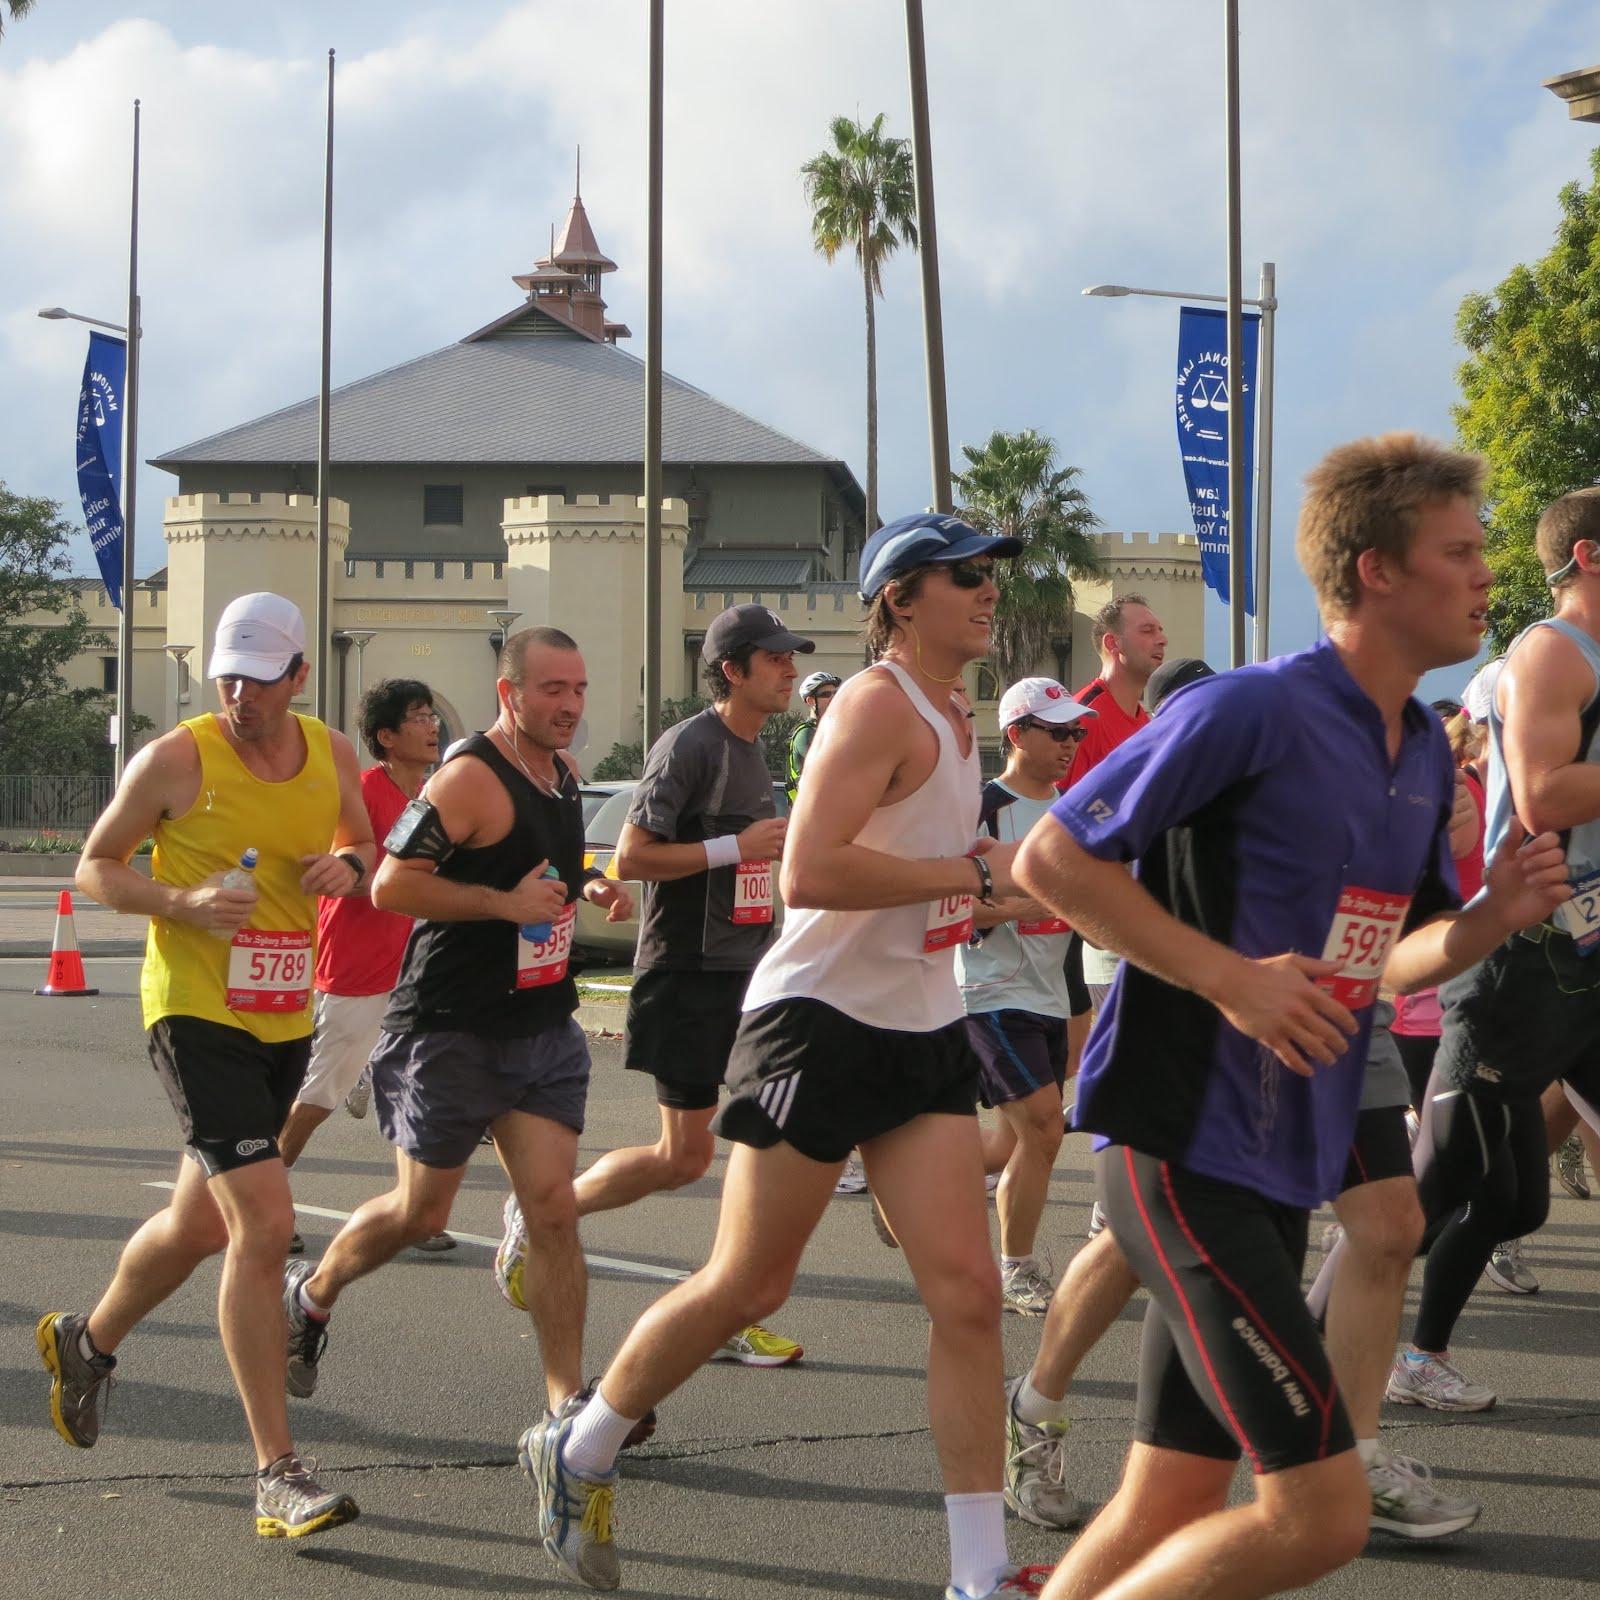 how to organise a fun run in australia